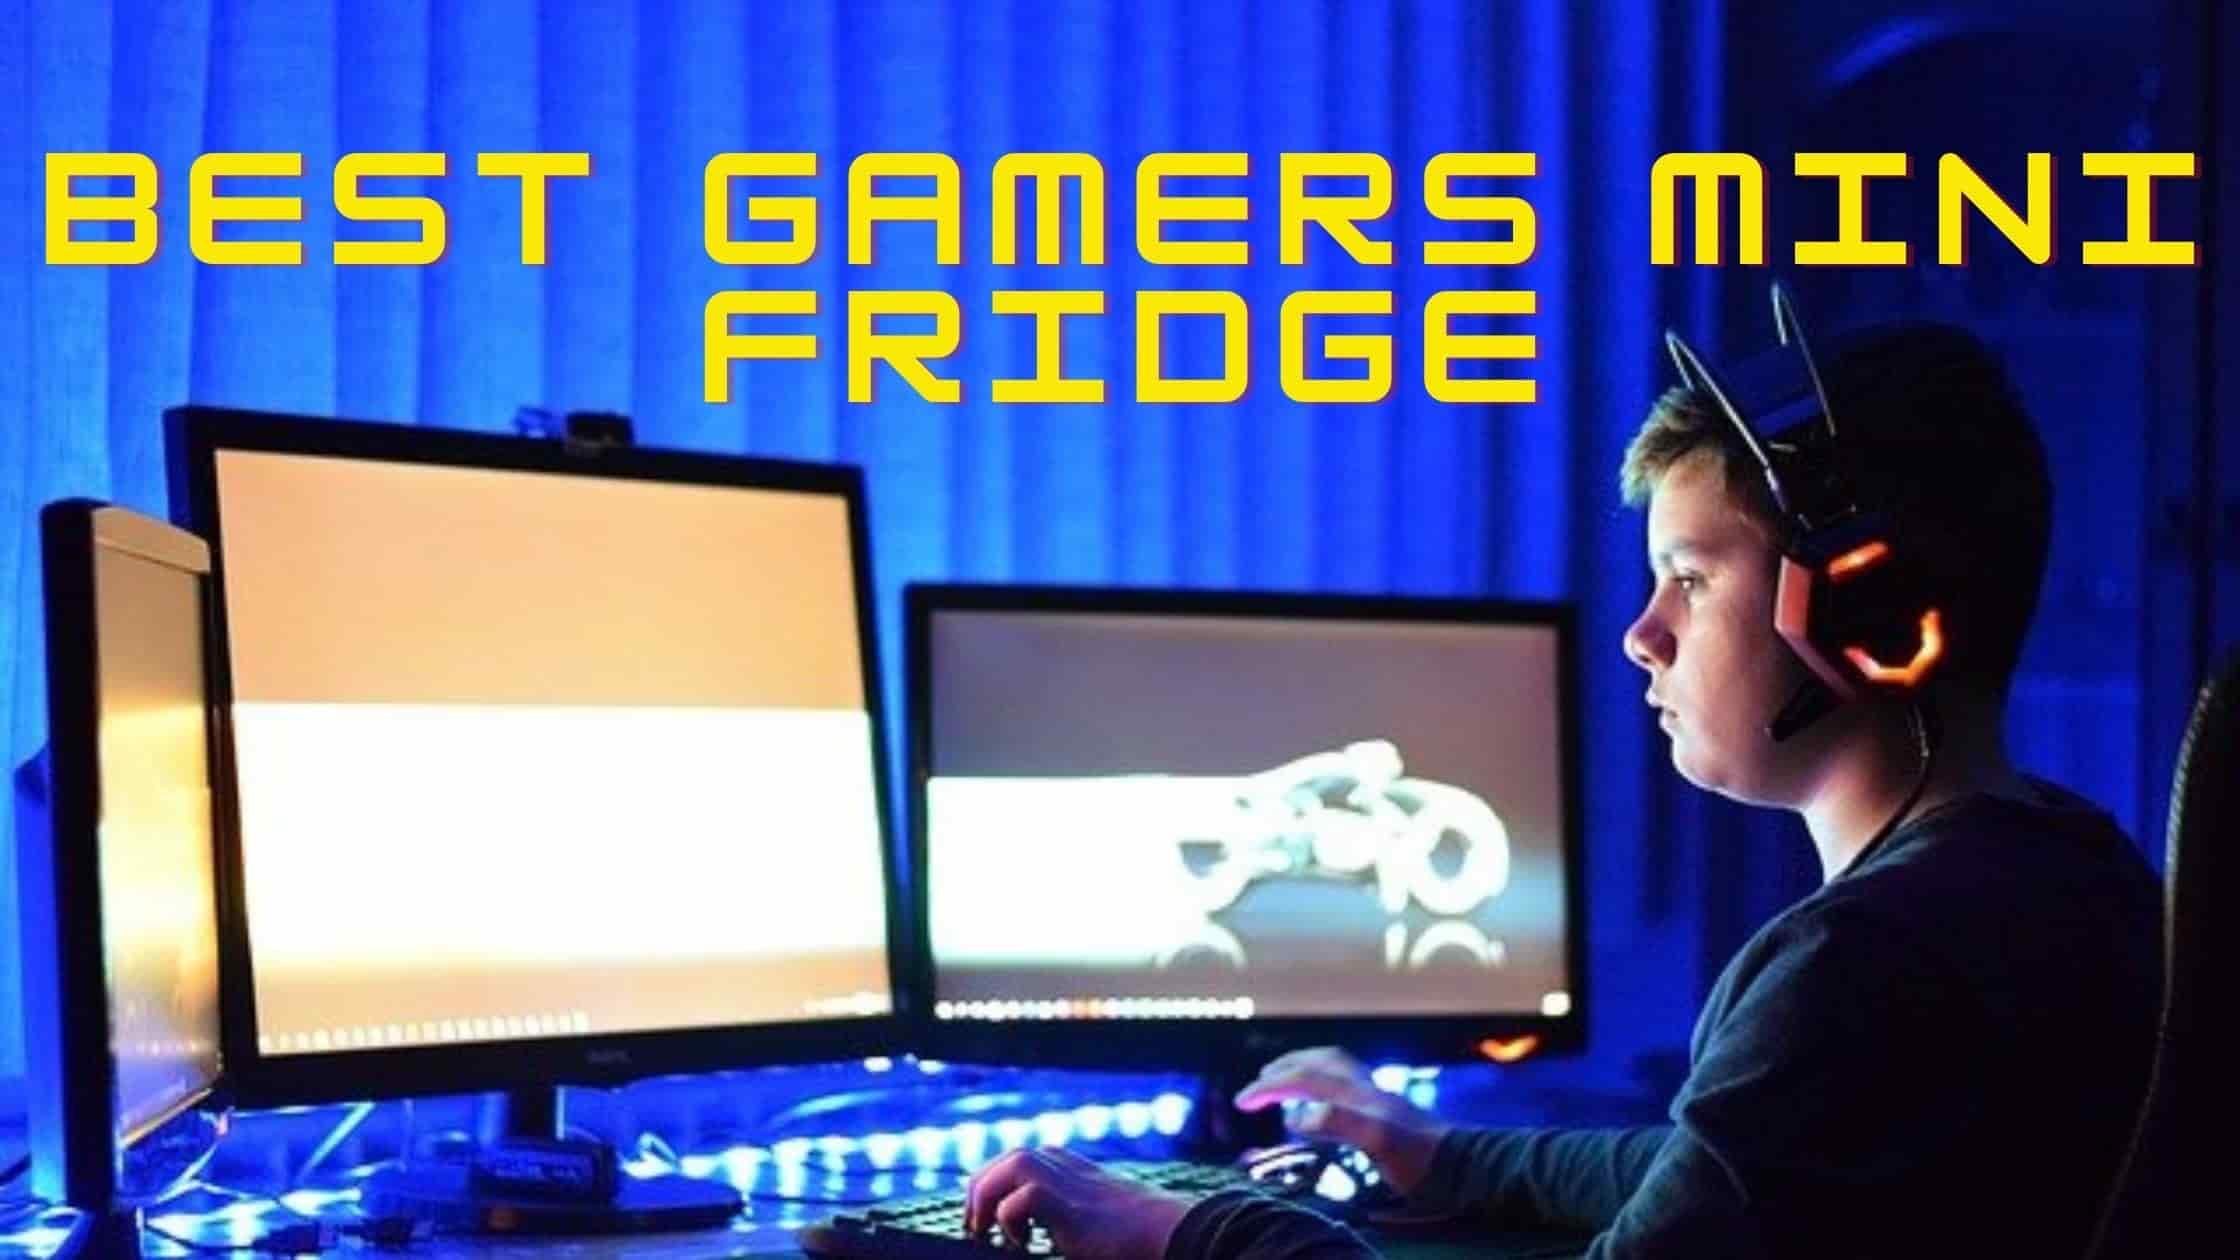 5 Best Gaming Mini Fridge 2021 for Gamers - Reviews & Guide